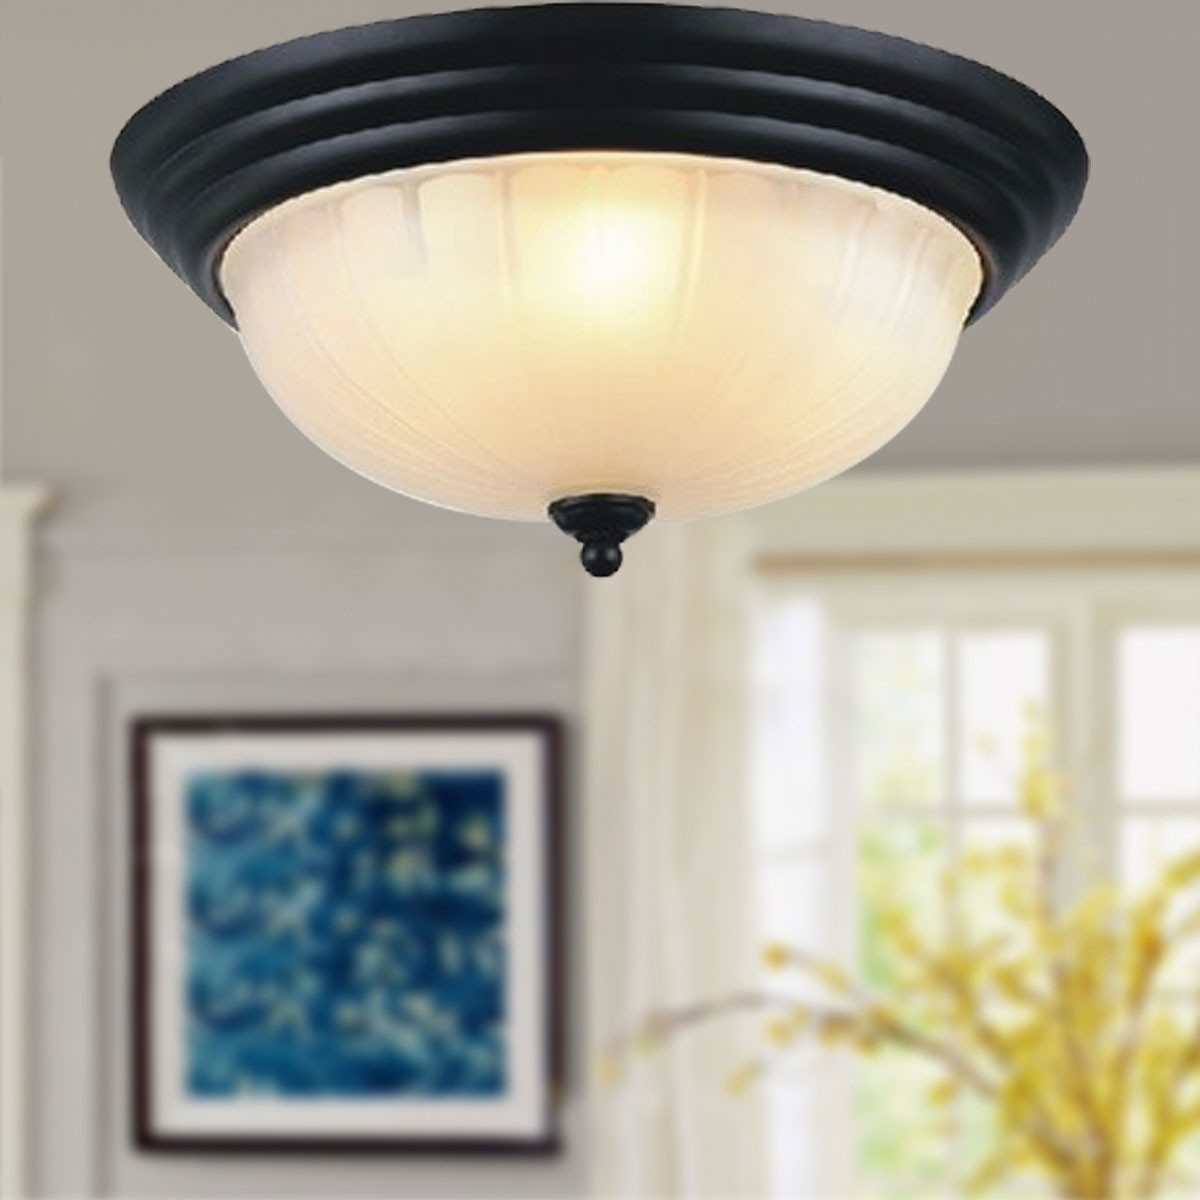 2-Light Iron Built Black Flush-Mount Ceiling Light with Glass Shades (DK-2031-300)